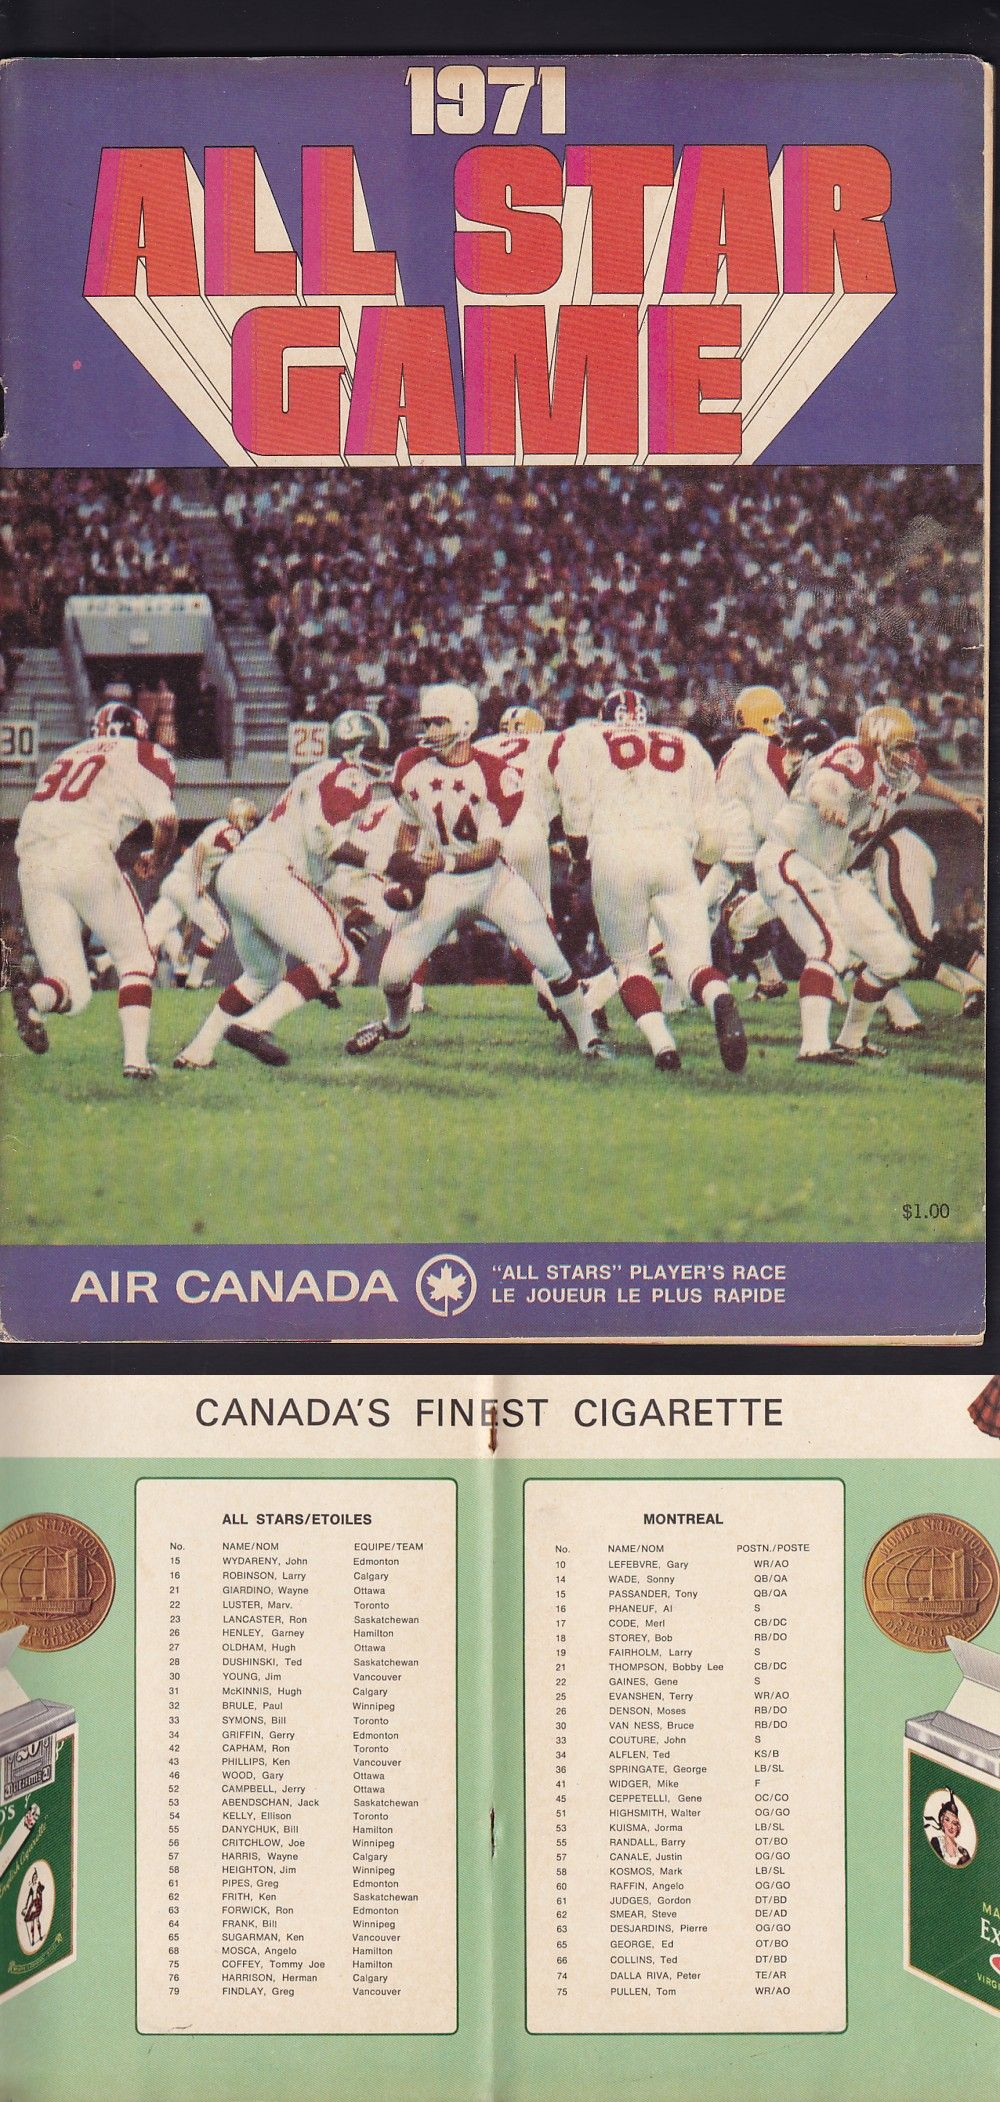 1971 CFL ALLSTAR GAME PROGRAM photo in 2020 Canadian